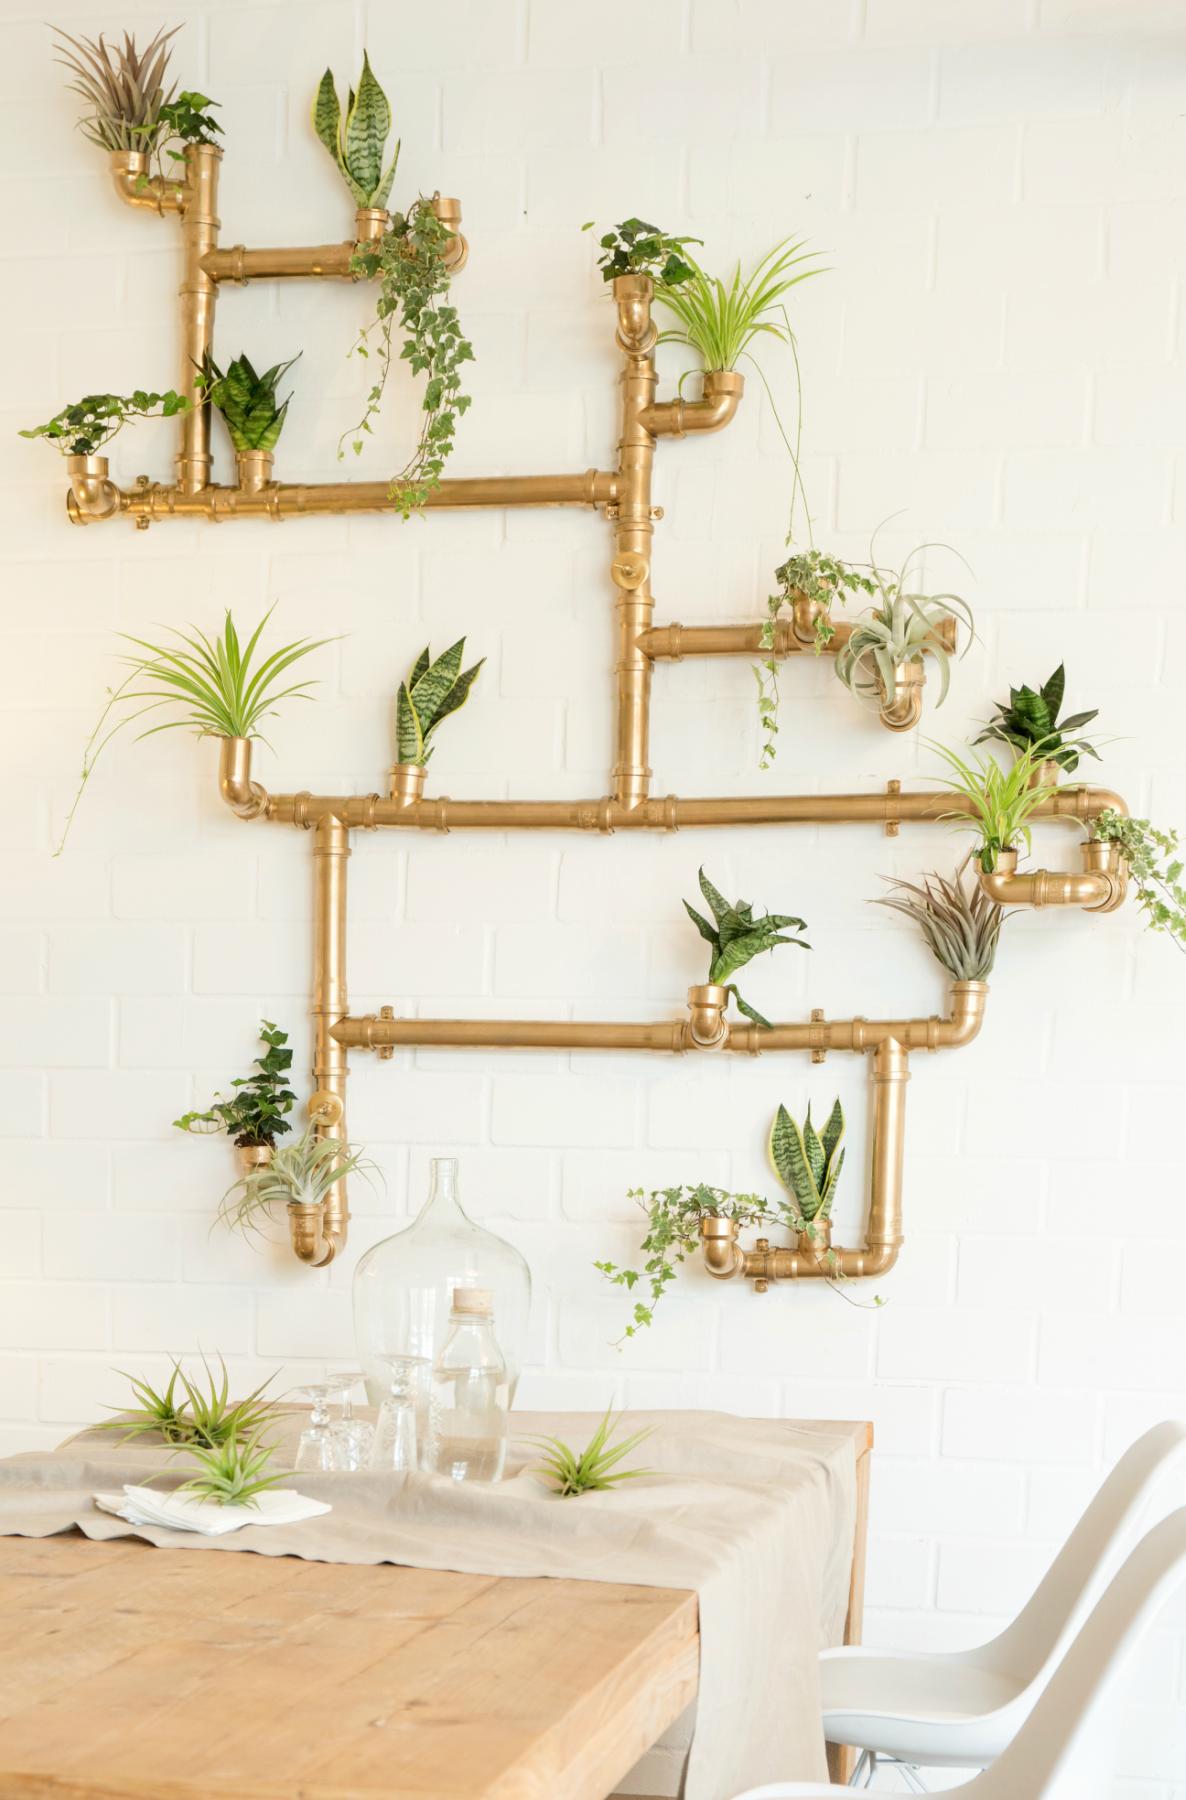 Pflanzenwand Selber Bauen diy anleitung imposante pflanzenwand selber bauen via dawanda com